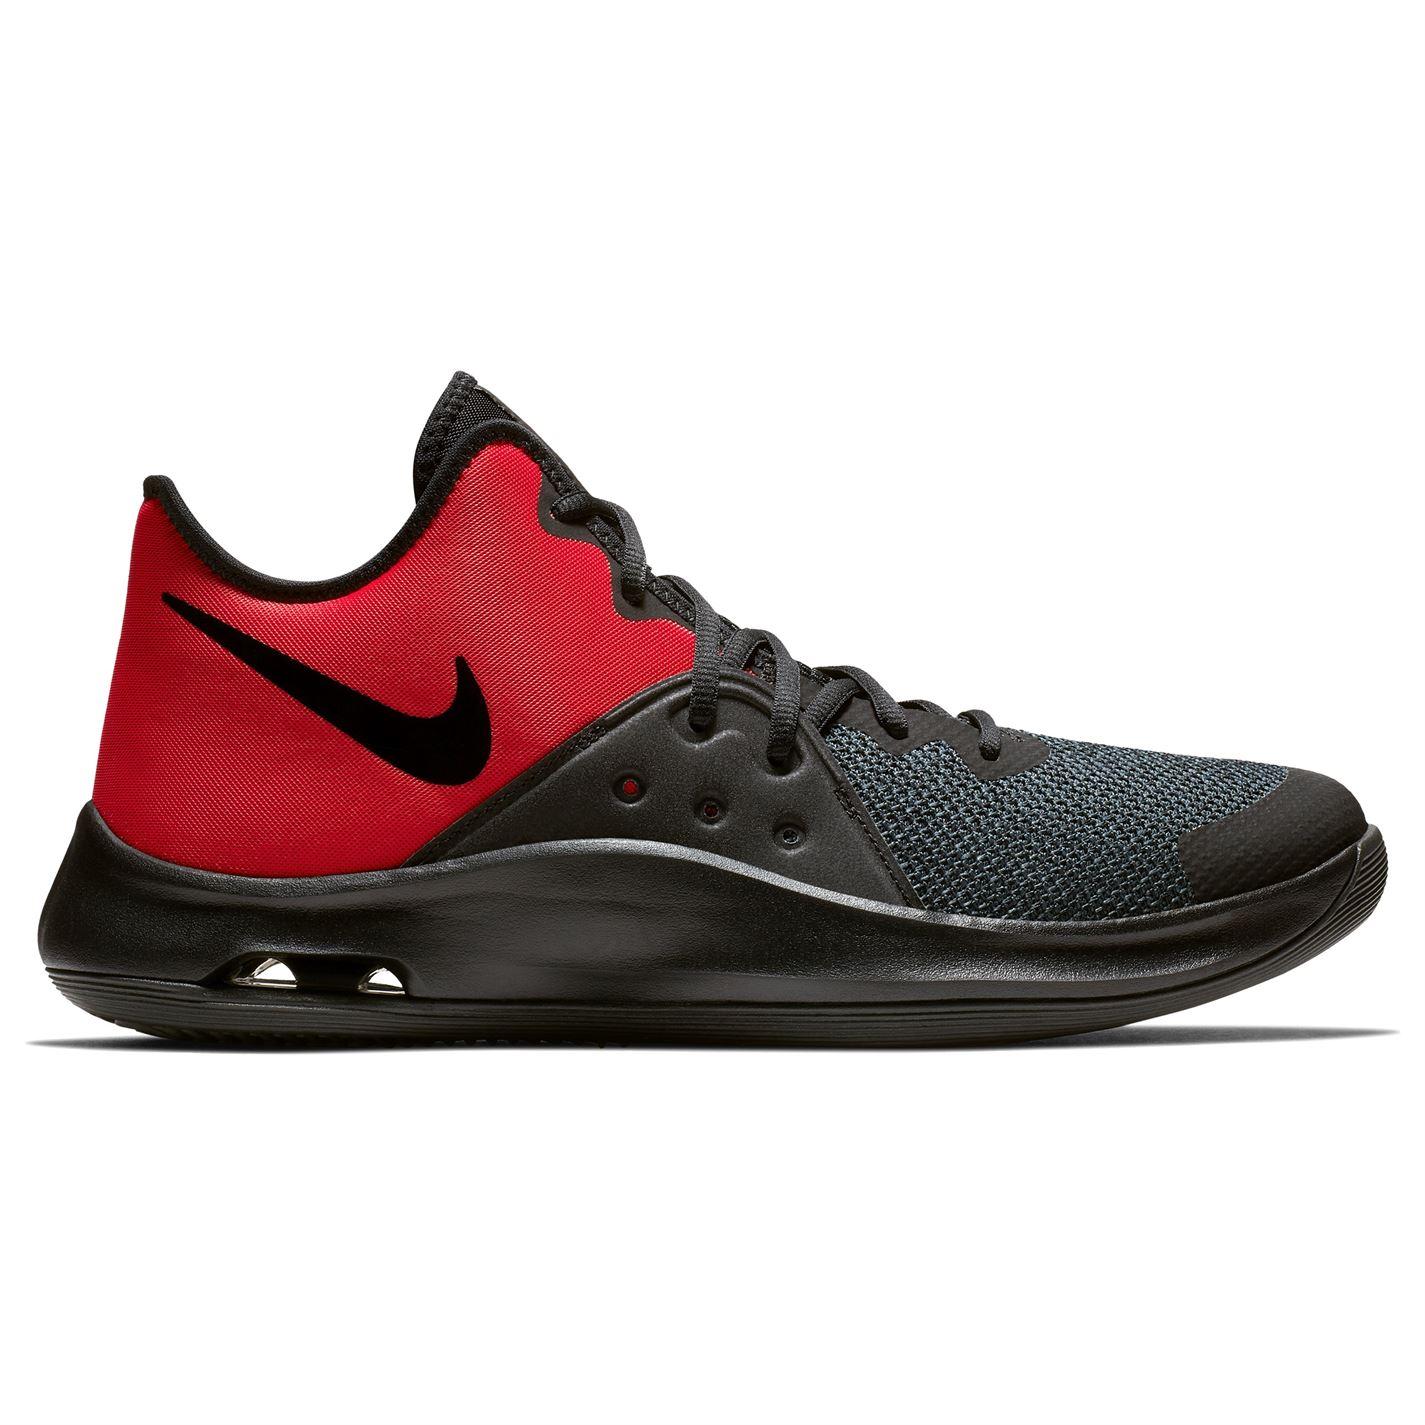 basketbalové boty boty Nike Air Versitile 3 pánske Baskteball